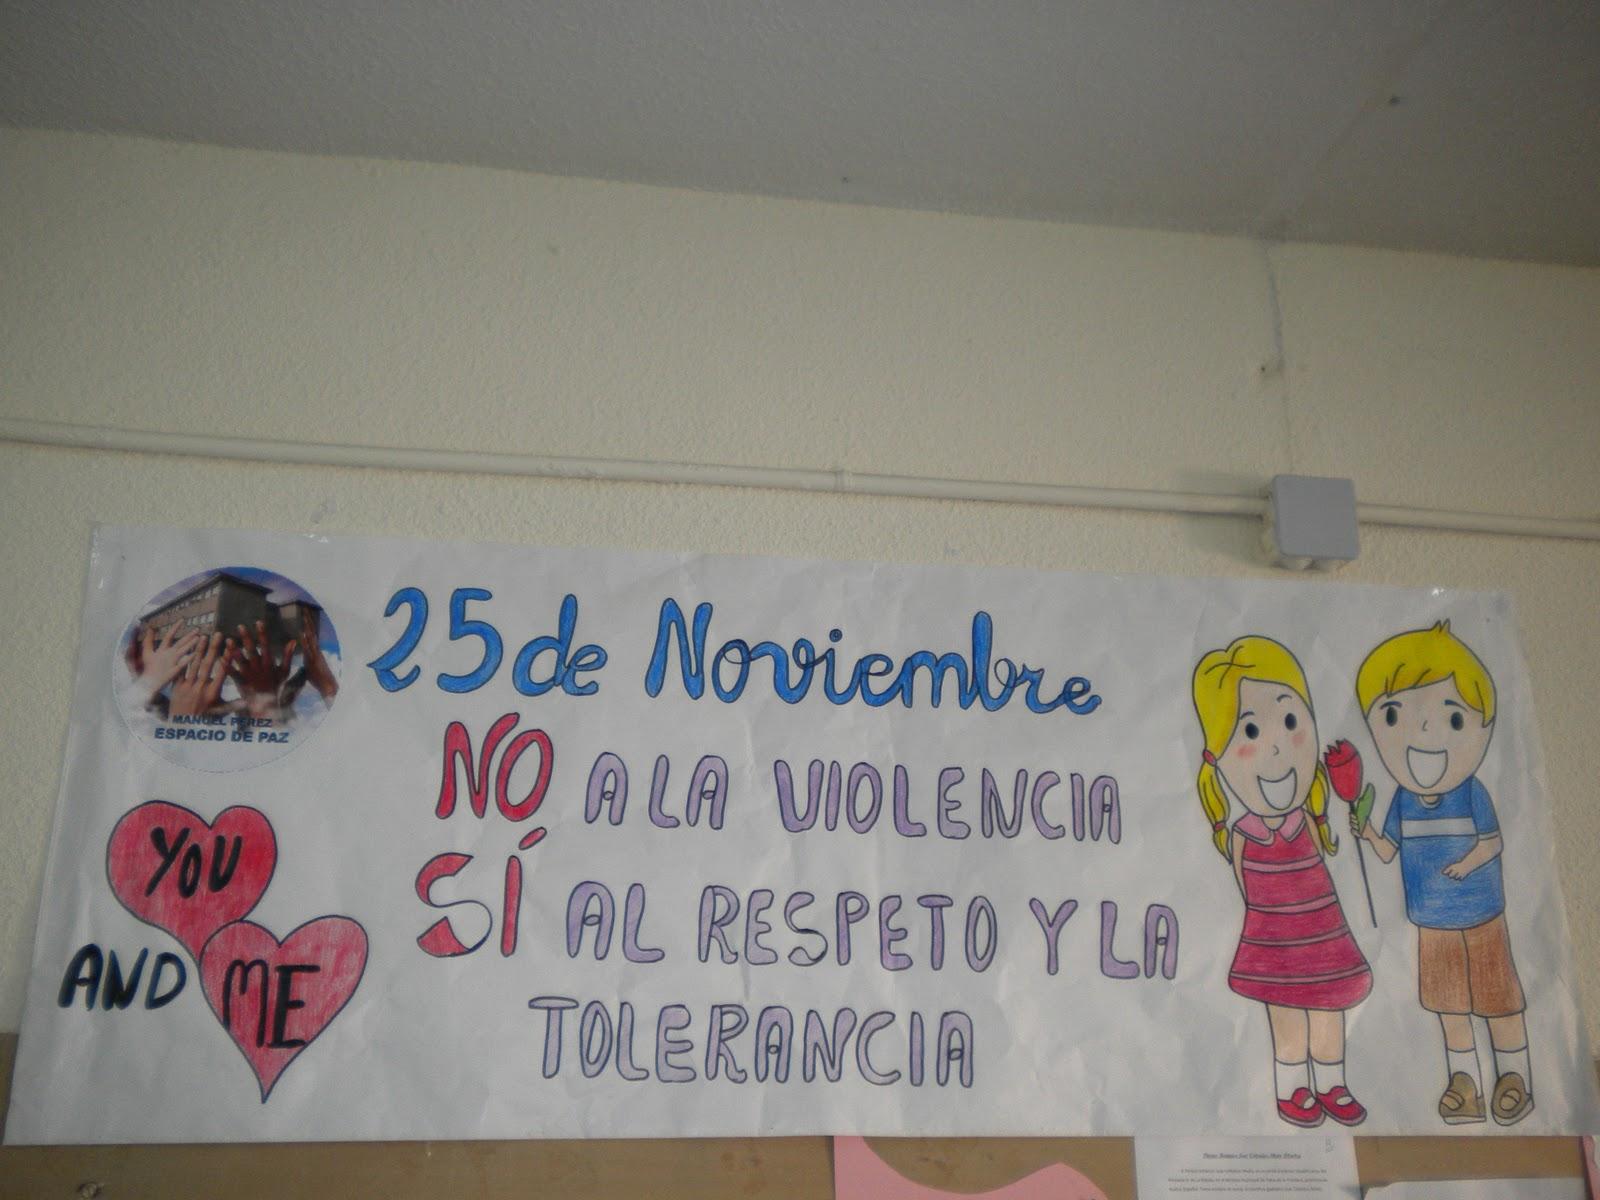 Imagenes De Carpetas Para El Preescolar De Cars | apexwallpapers.com